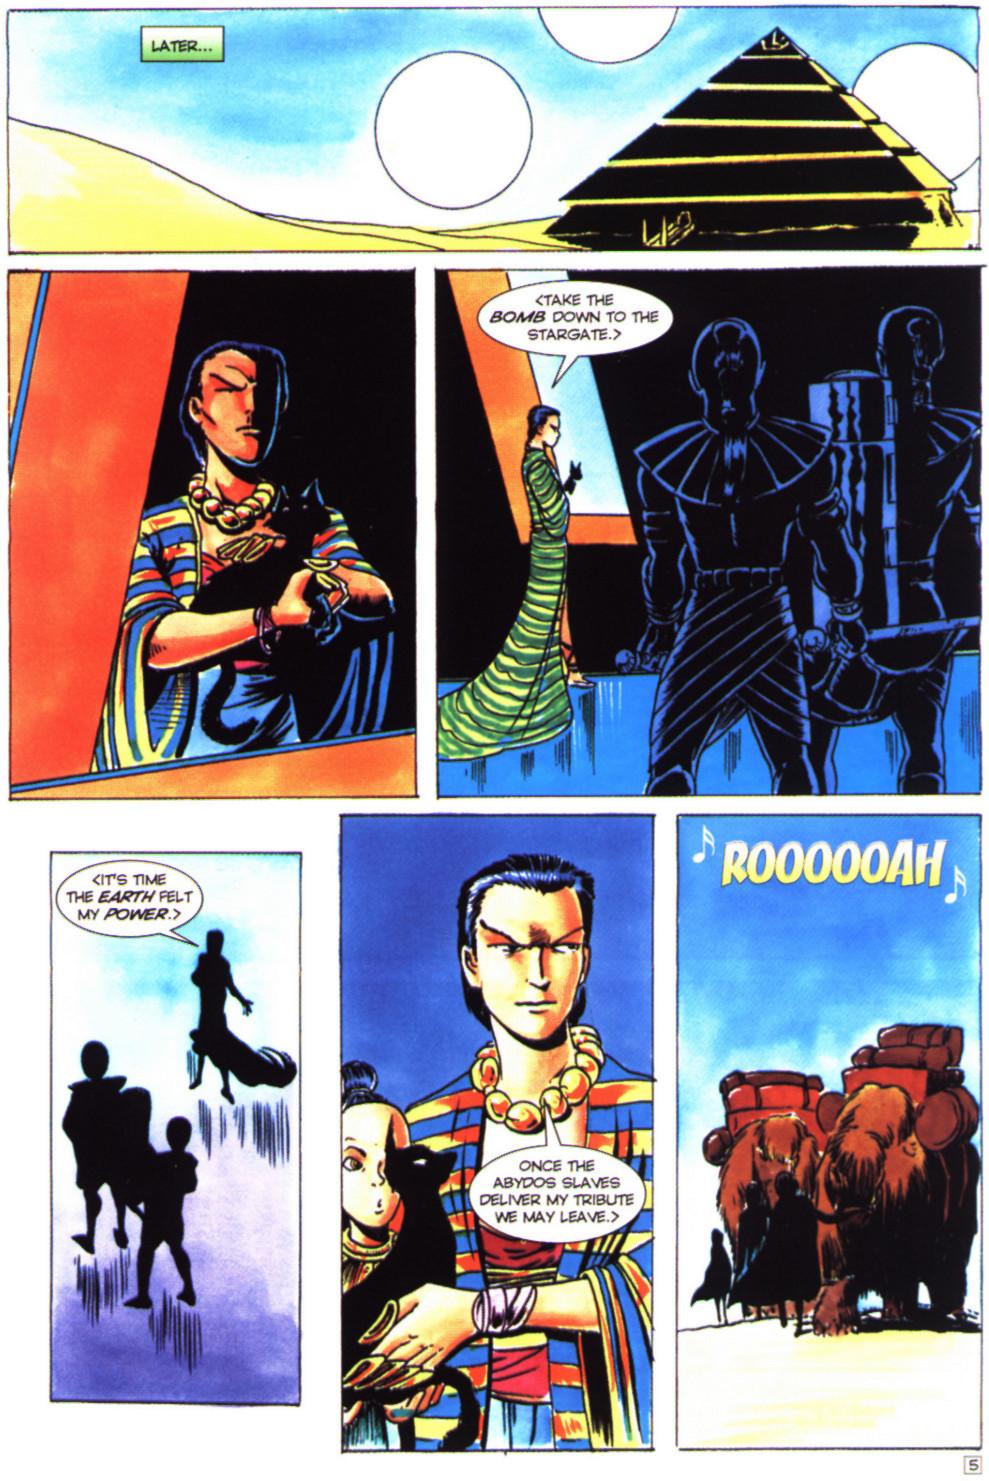 Read online Stargate comic -  Issue #4 - 7